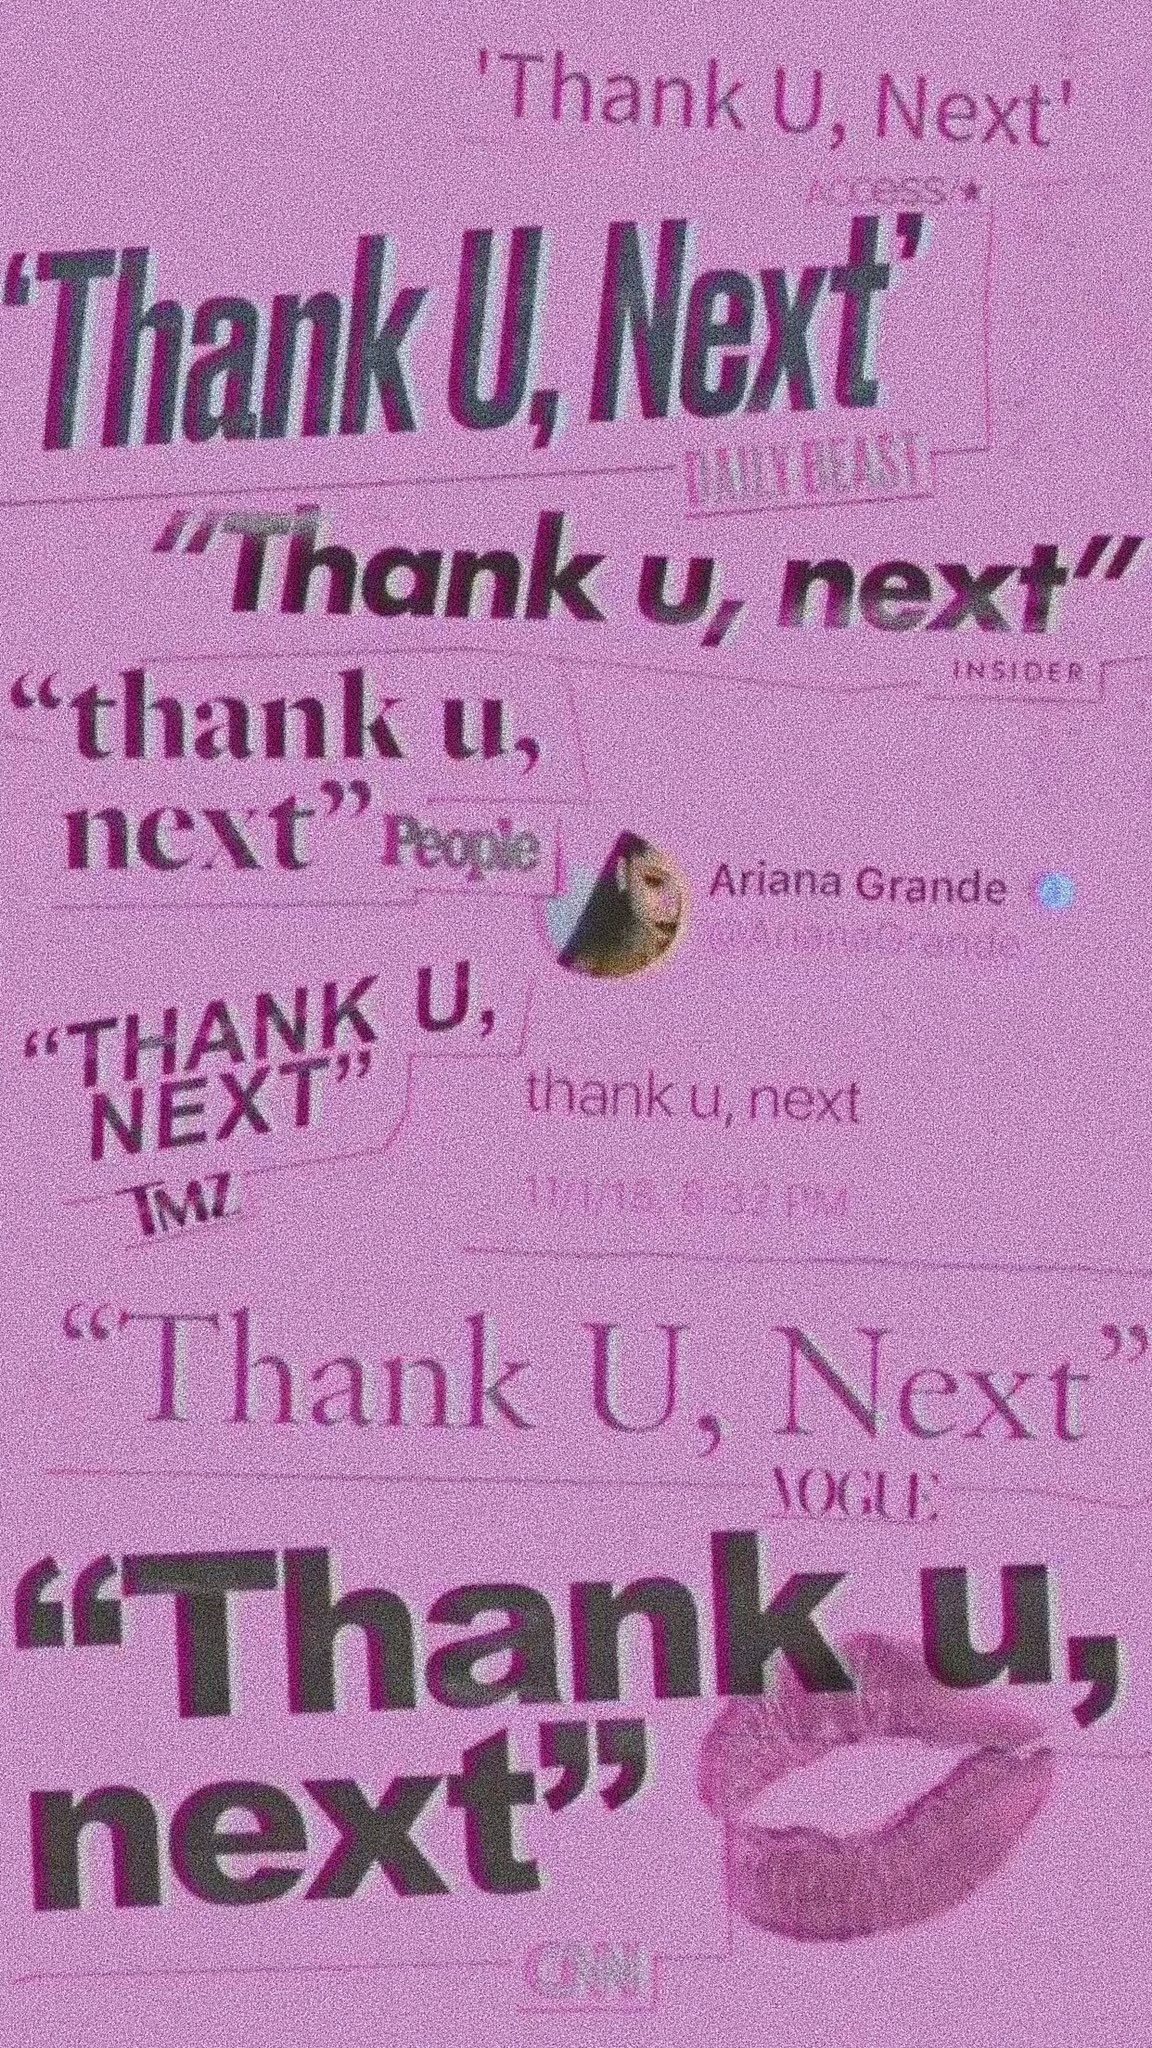 Ariana Grande - Thank U, Next [2019] MP3 (320kbps)